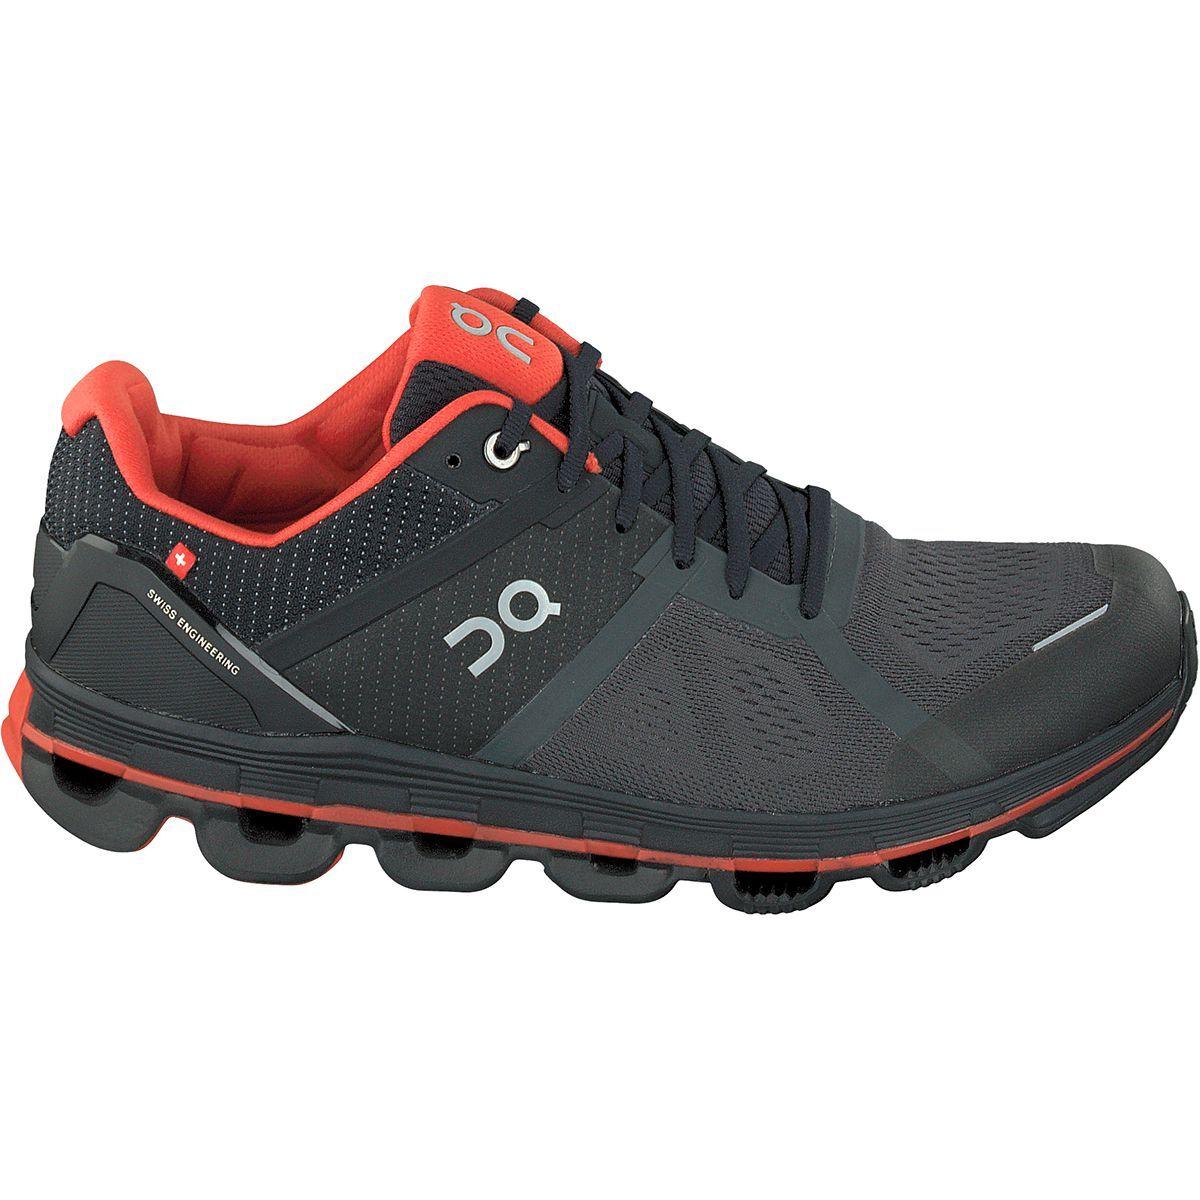 ON Running Herren Cloudace Schuhe